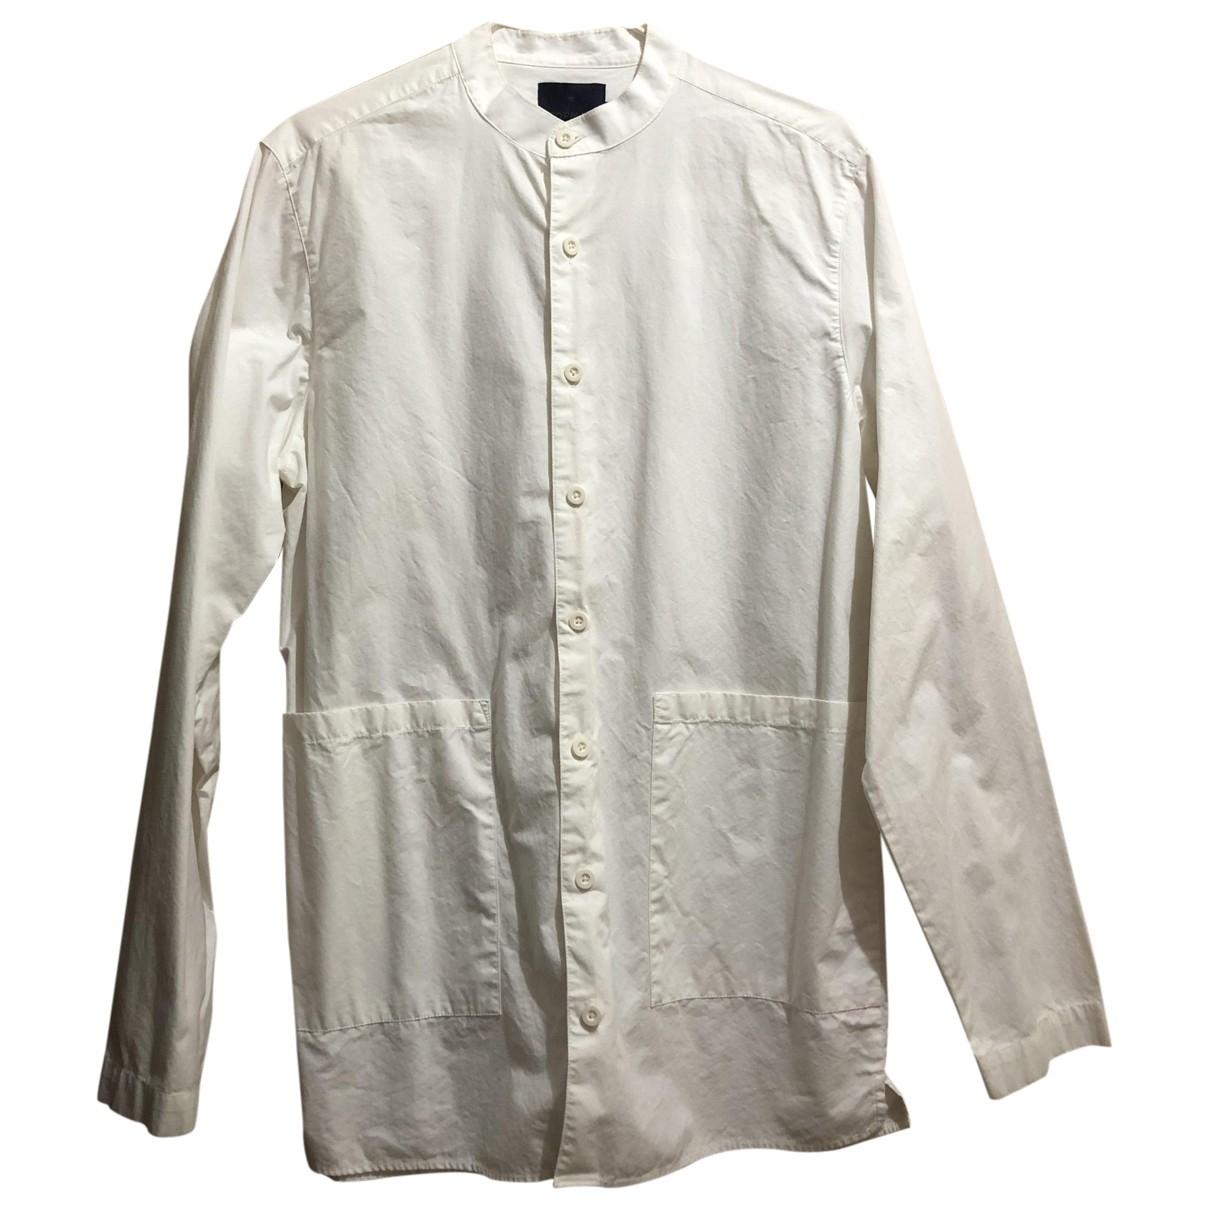 Topman \N White Cotton Shirts for Men XS International